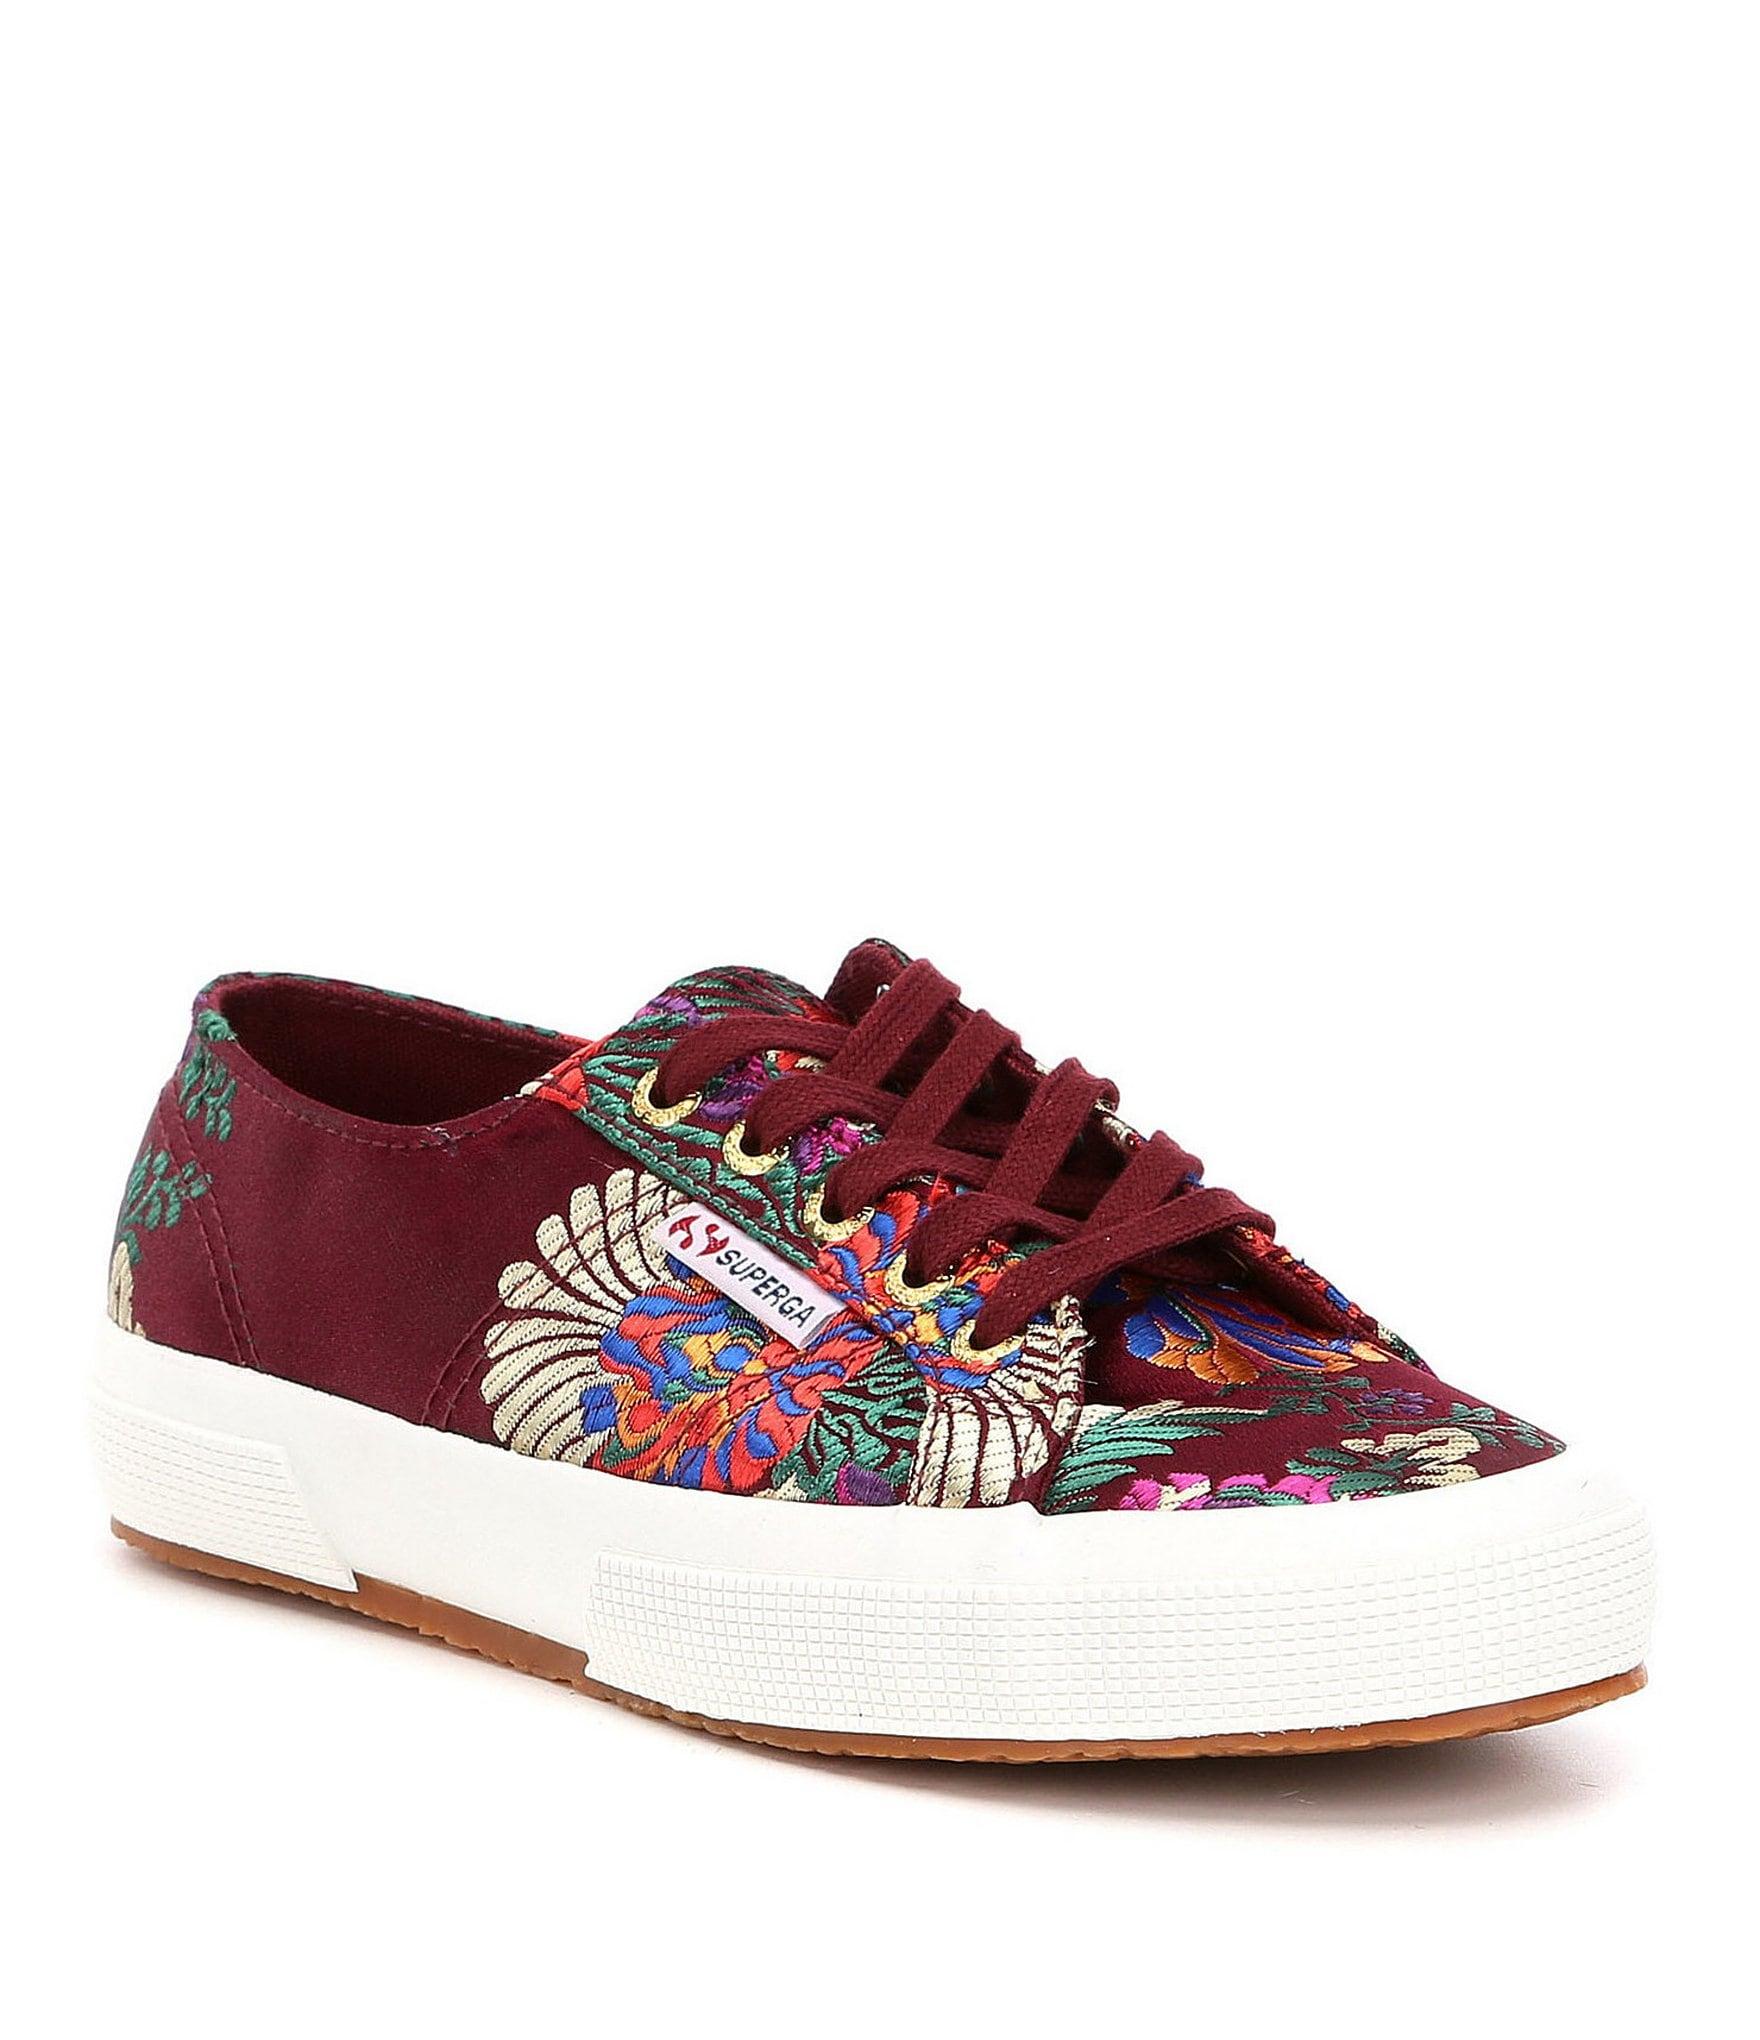 Superga 2750 Korelaw Mandarin Floral Embroidery Sneakers